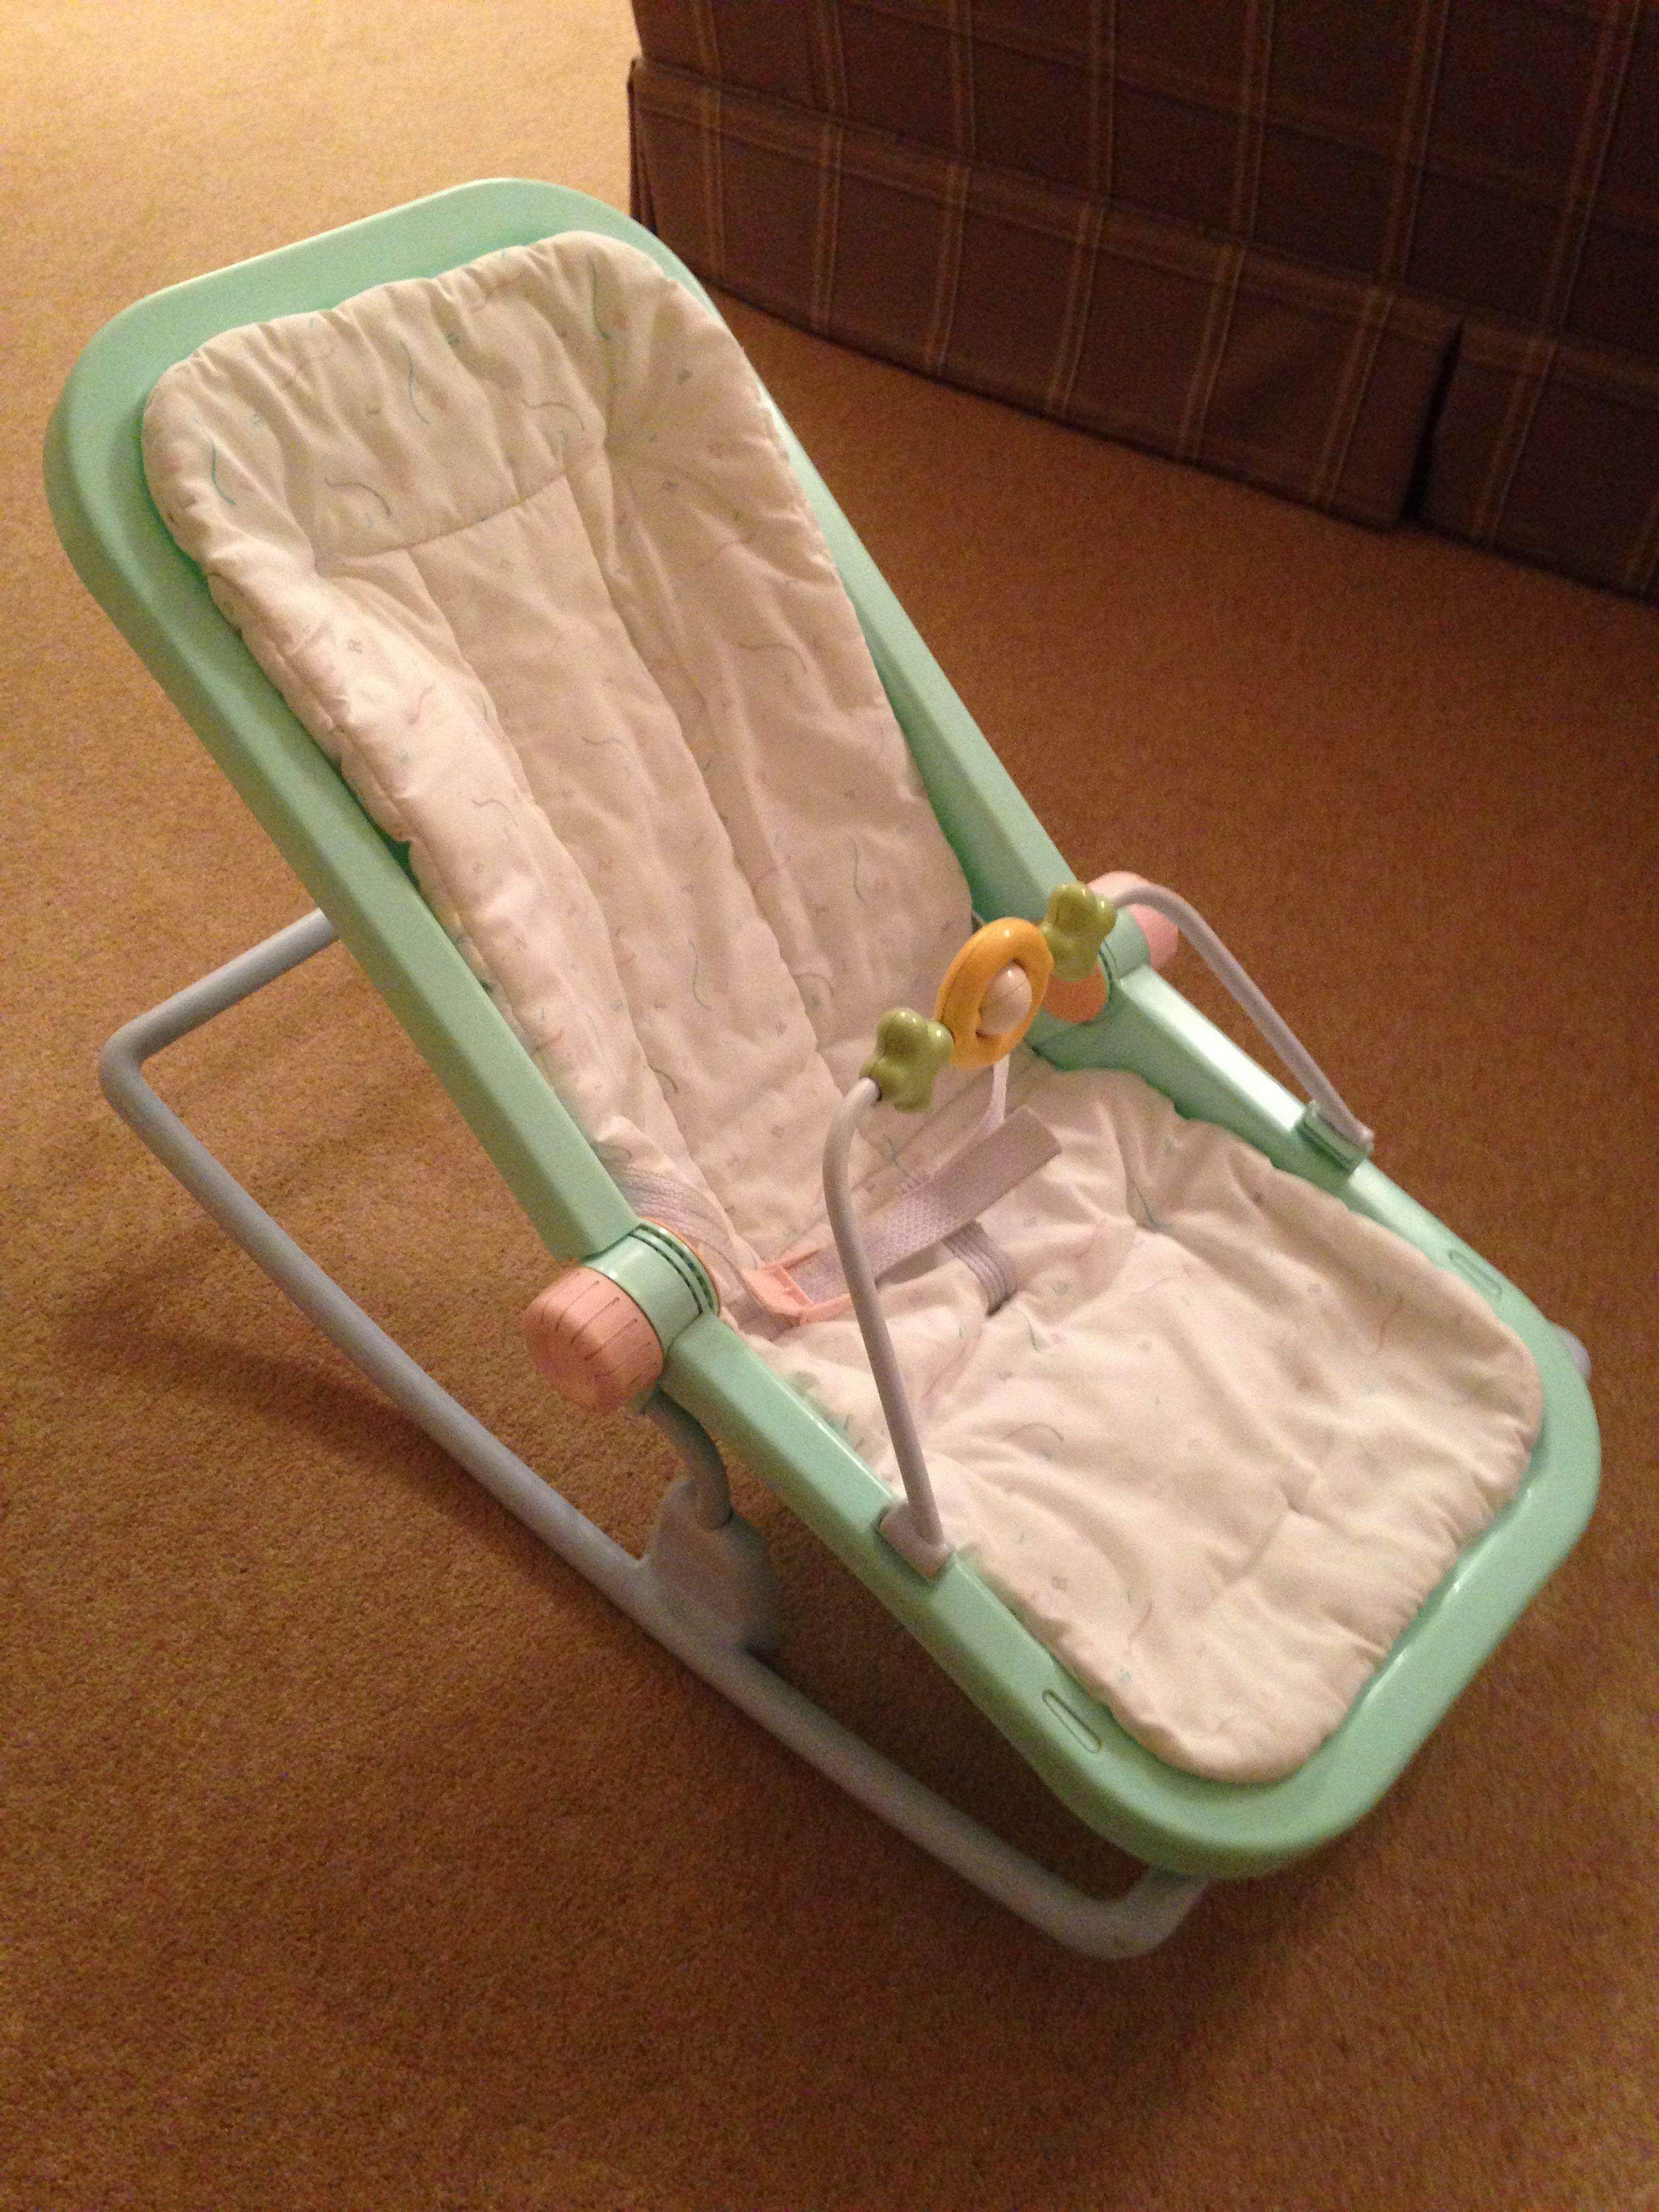 80s Mothercare rocking baby chair | Vintage baby | Pinterest | Nostalgia